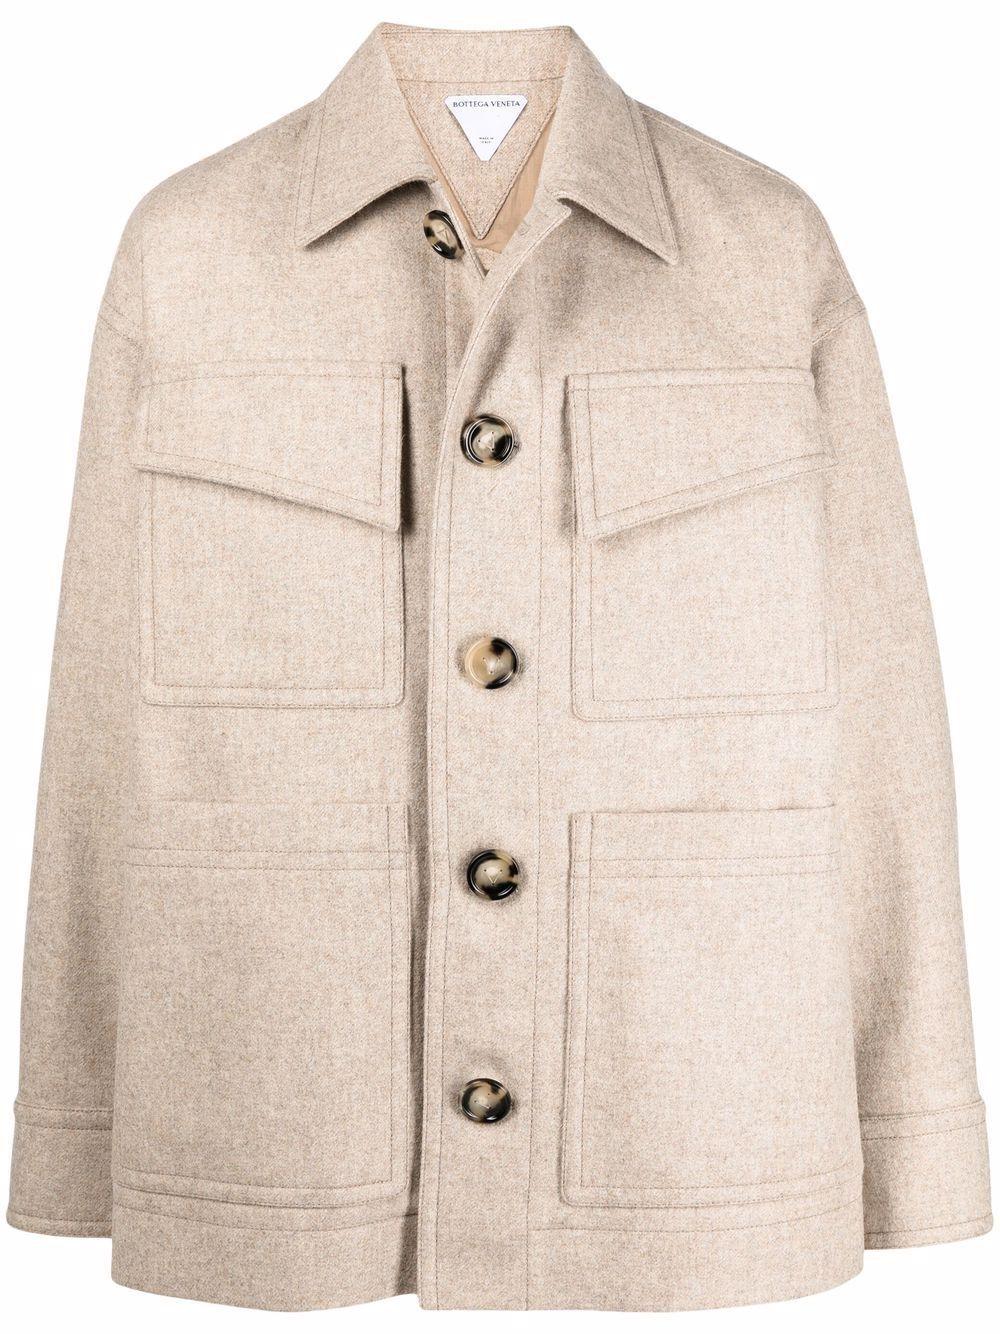 Bottega veneta giacconi beige